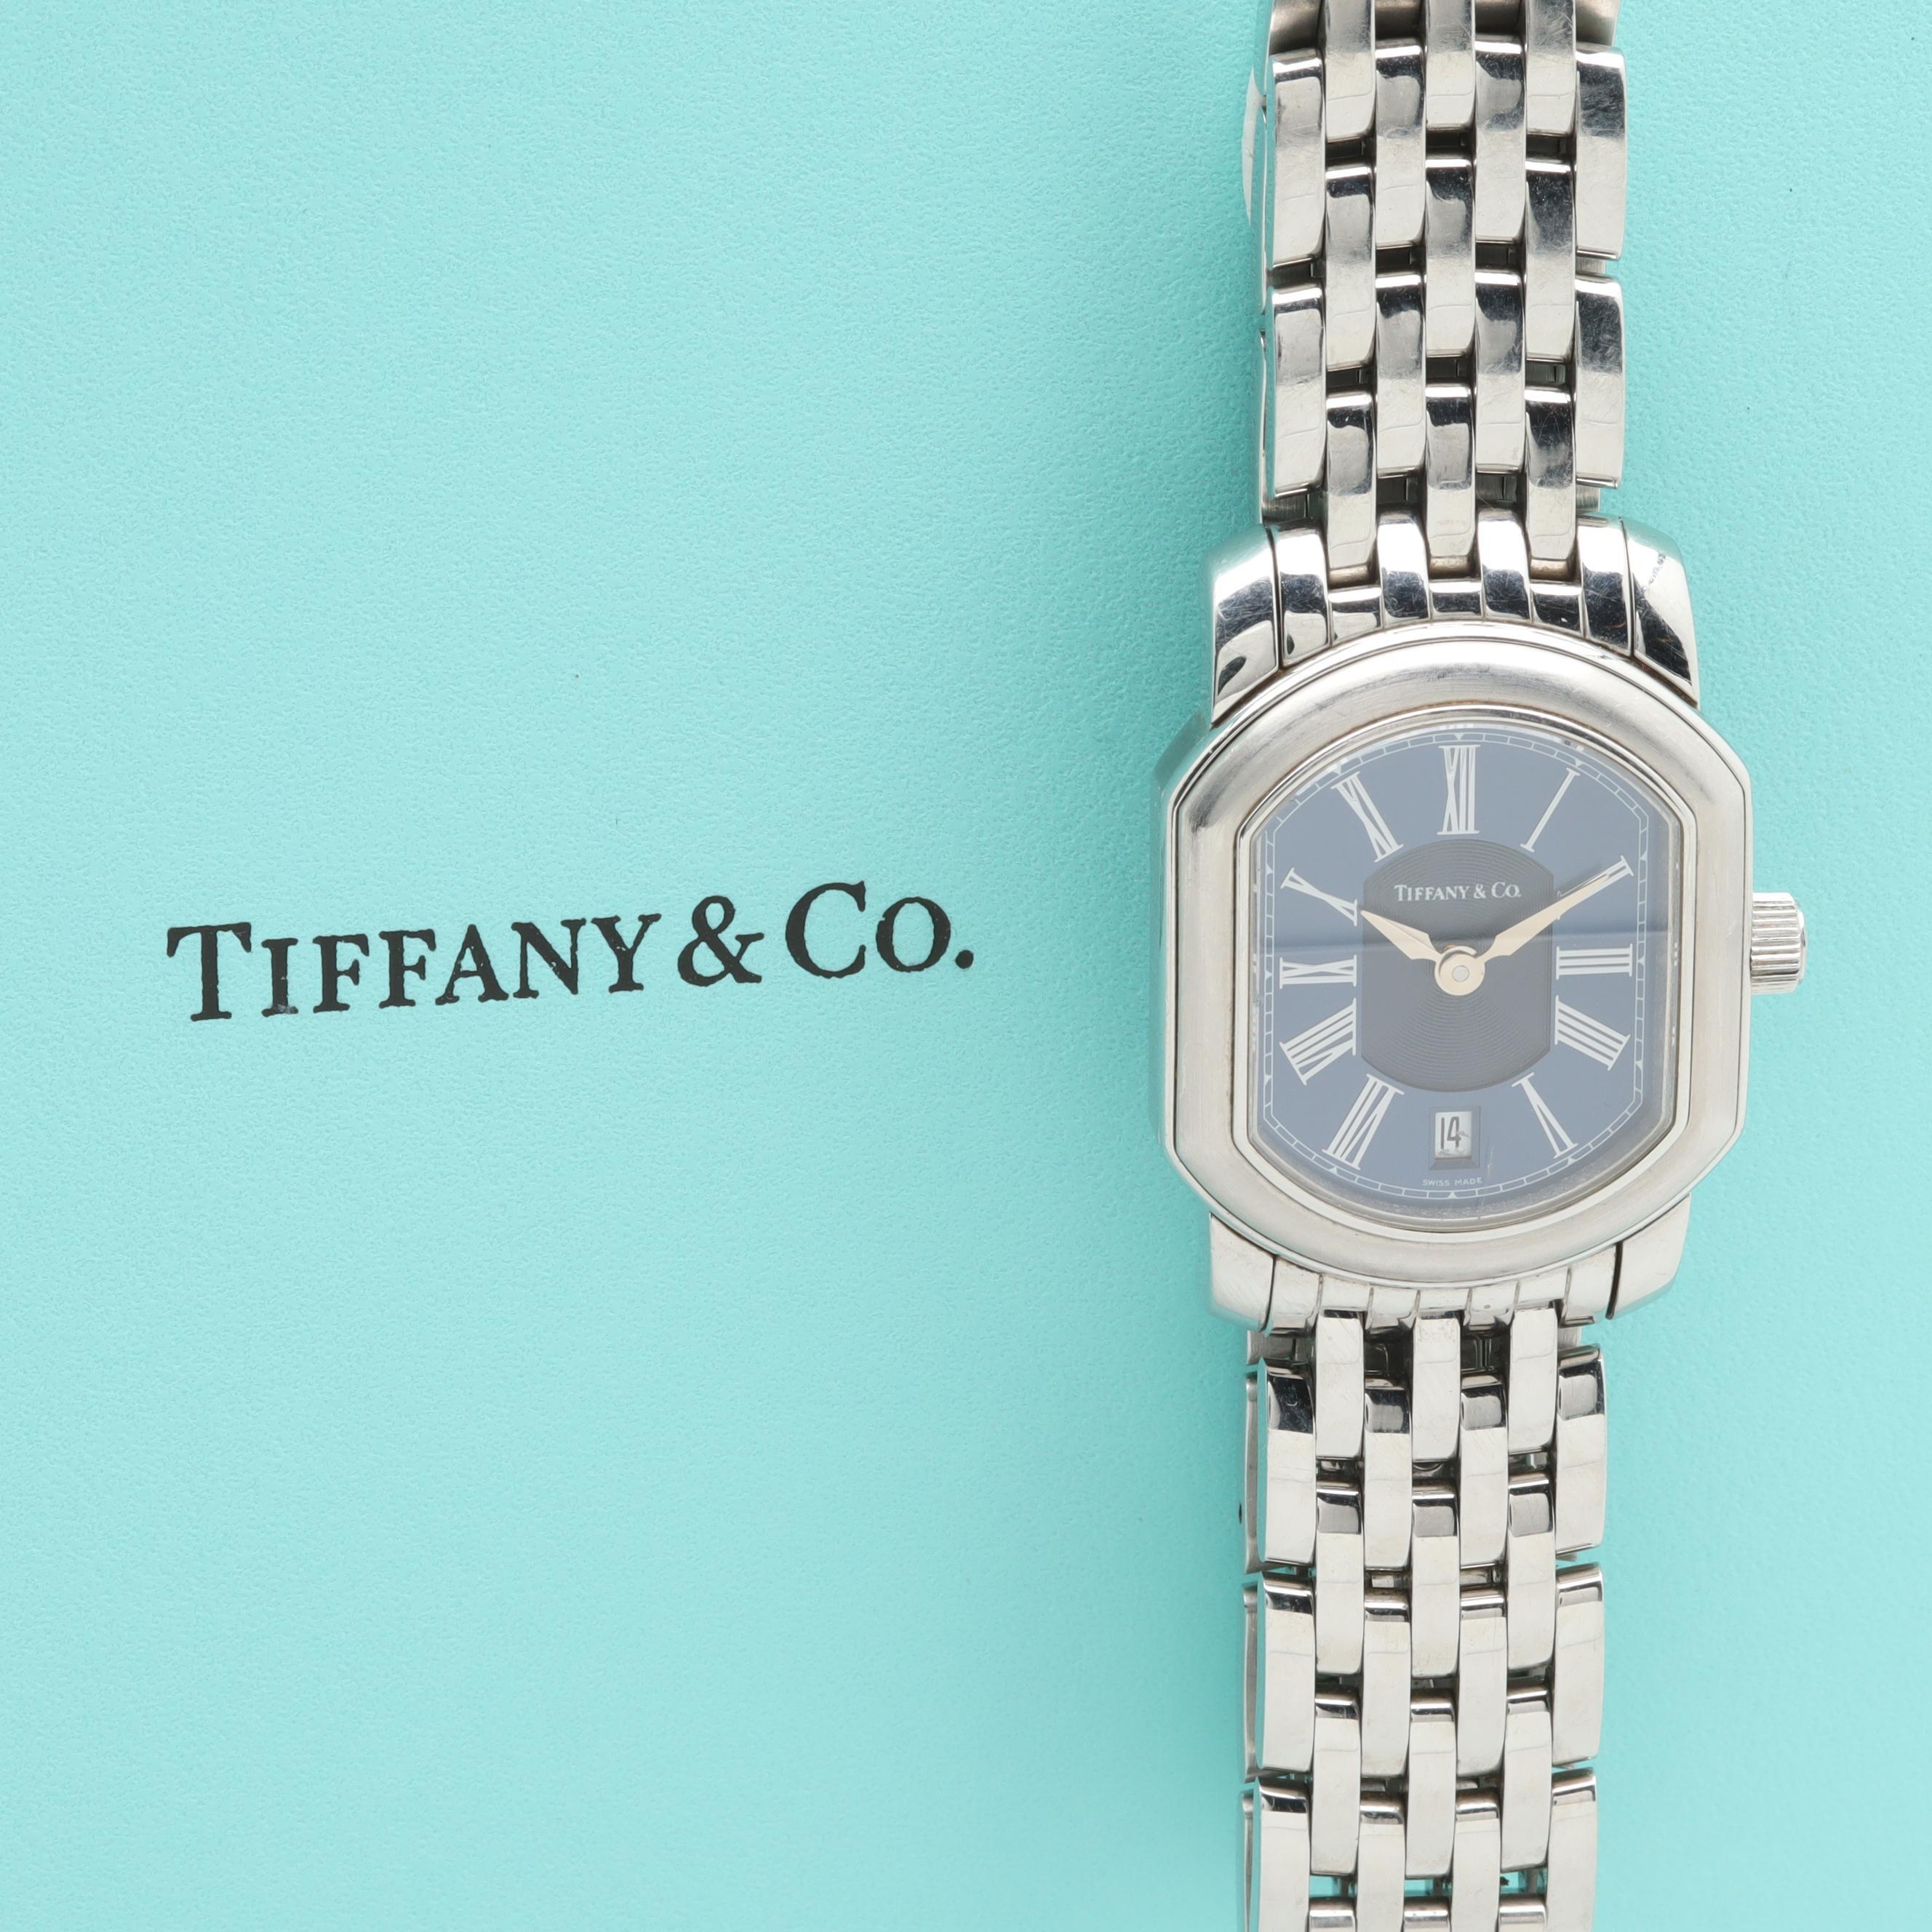 Tiffany & Co. Stainless Steel Swiss Made Wristwatch